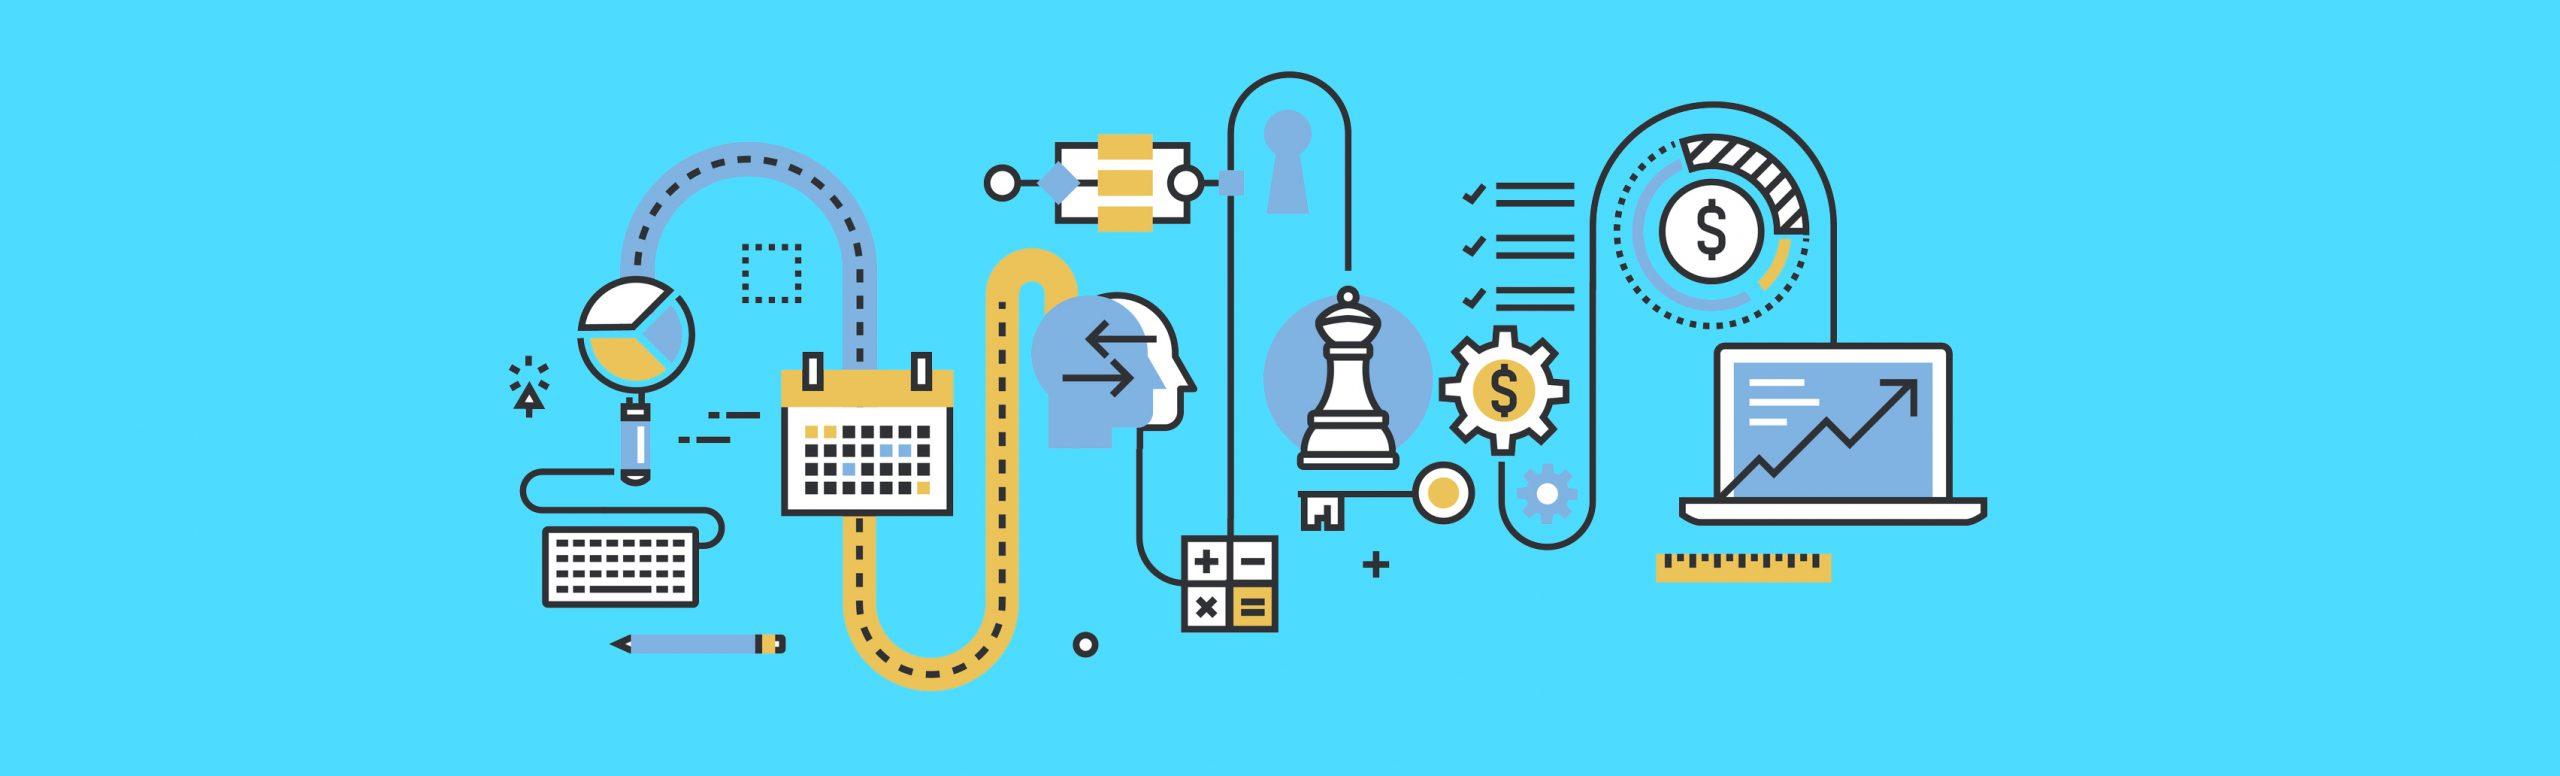 Tahapan Siklus Akuntansi Perusahaan Manufaktur